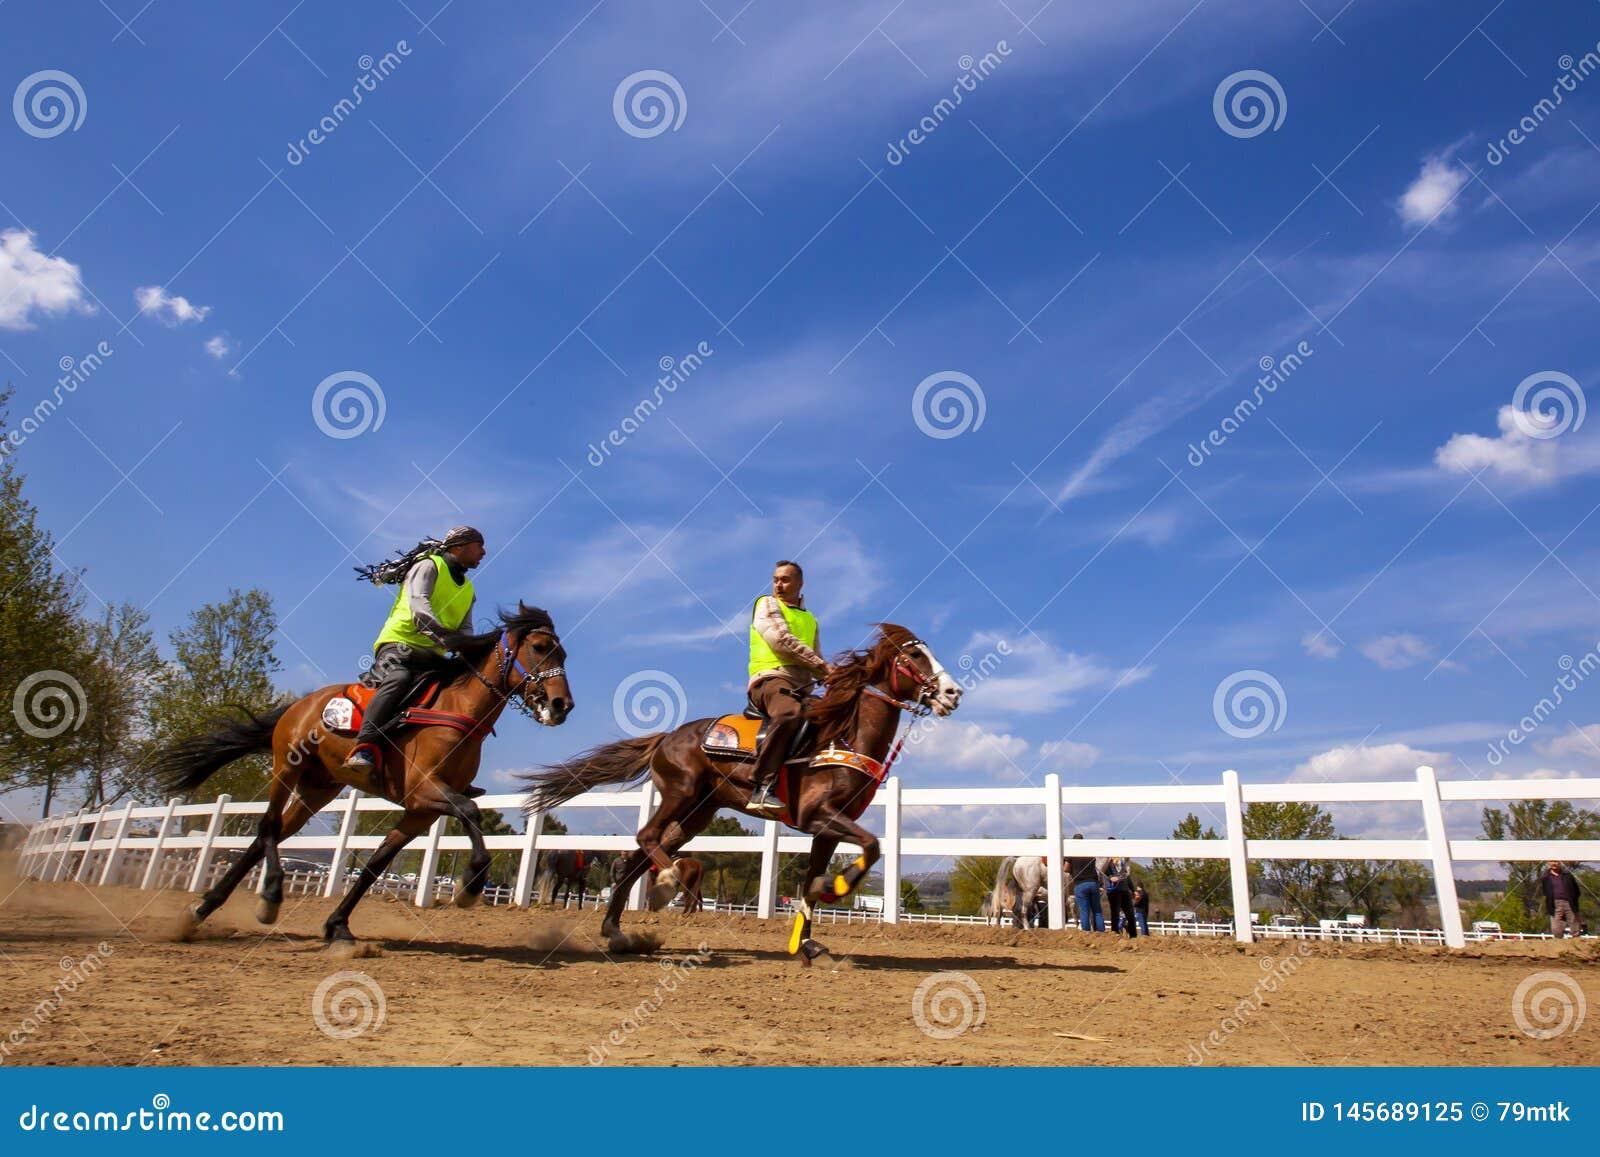 International Conquering Festival Rahvan Horse Racing